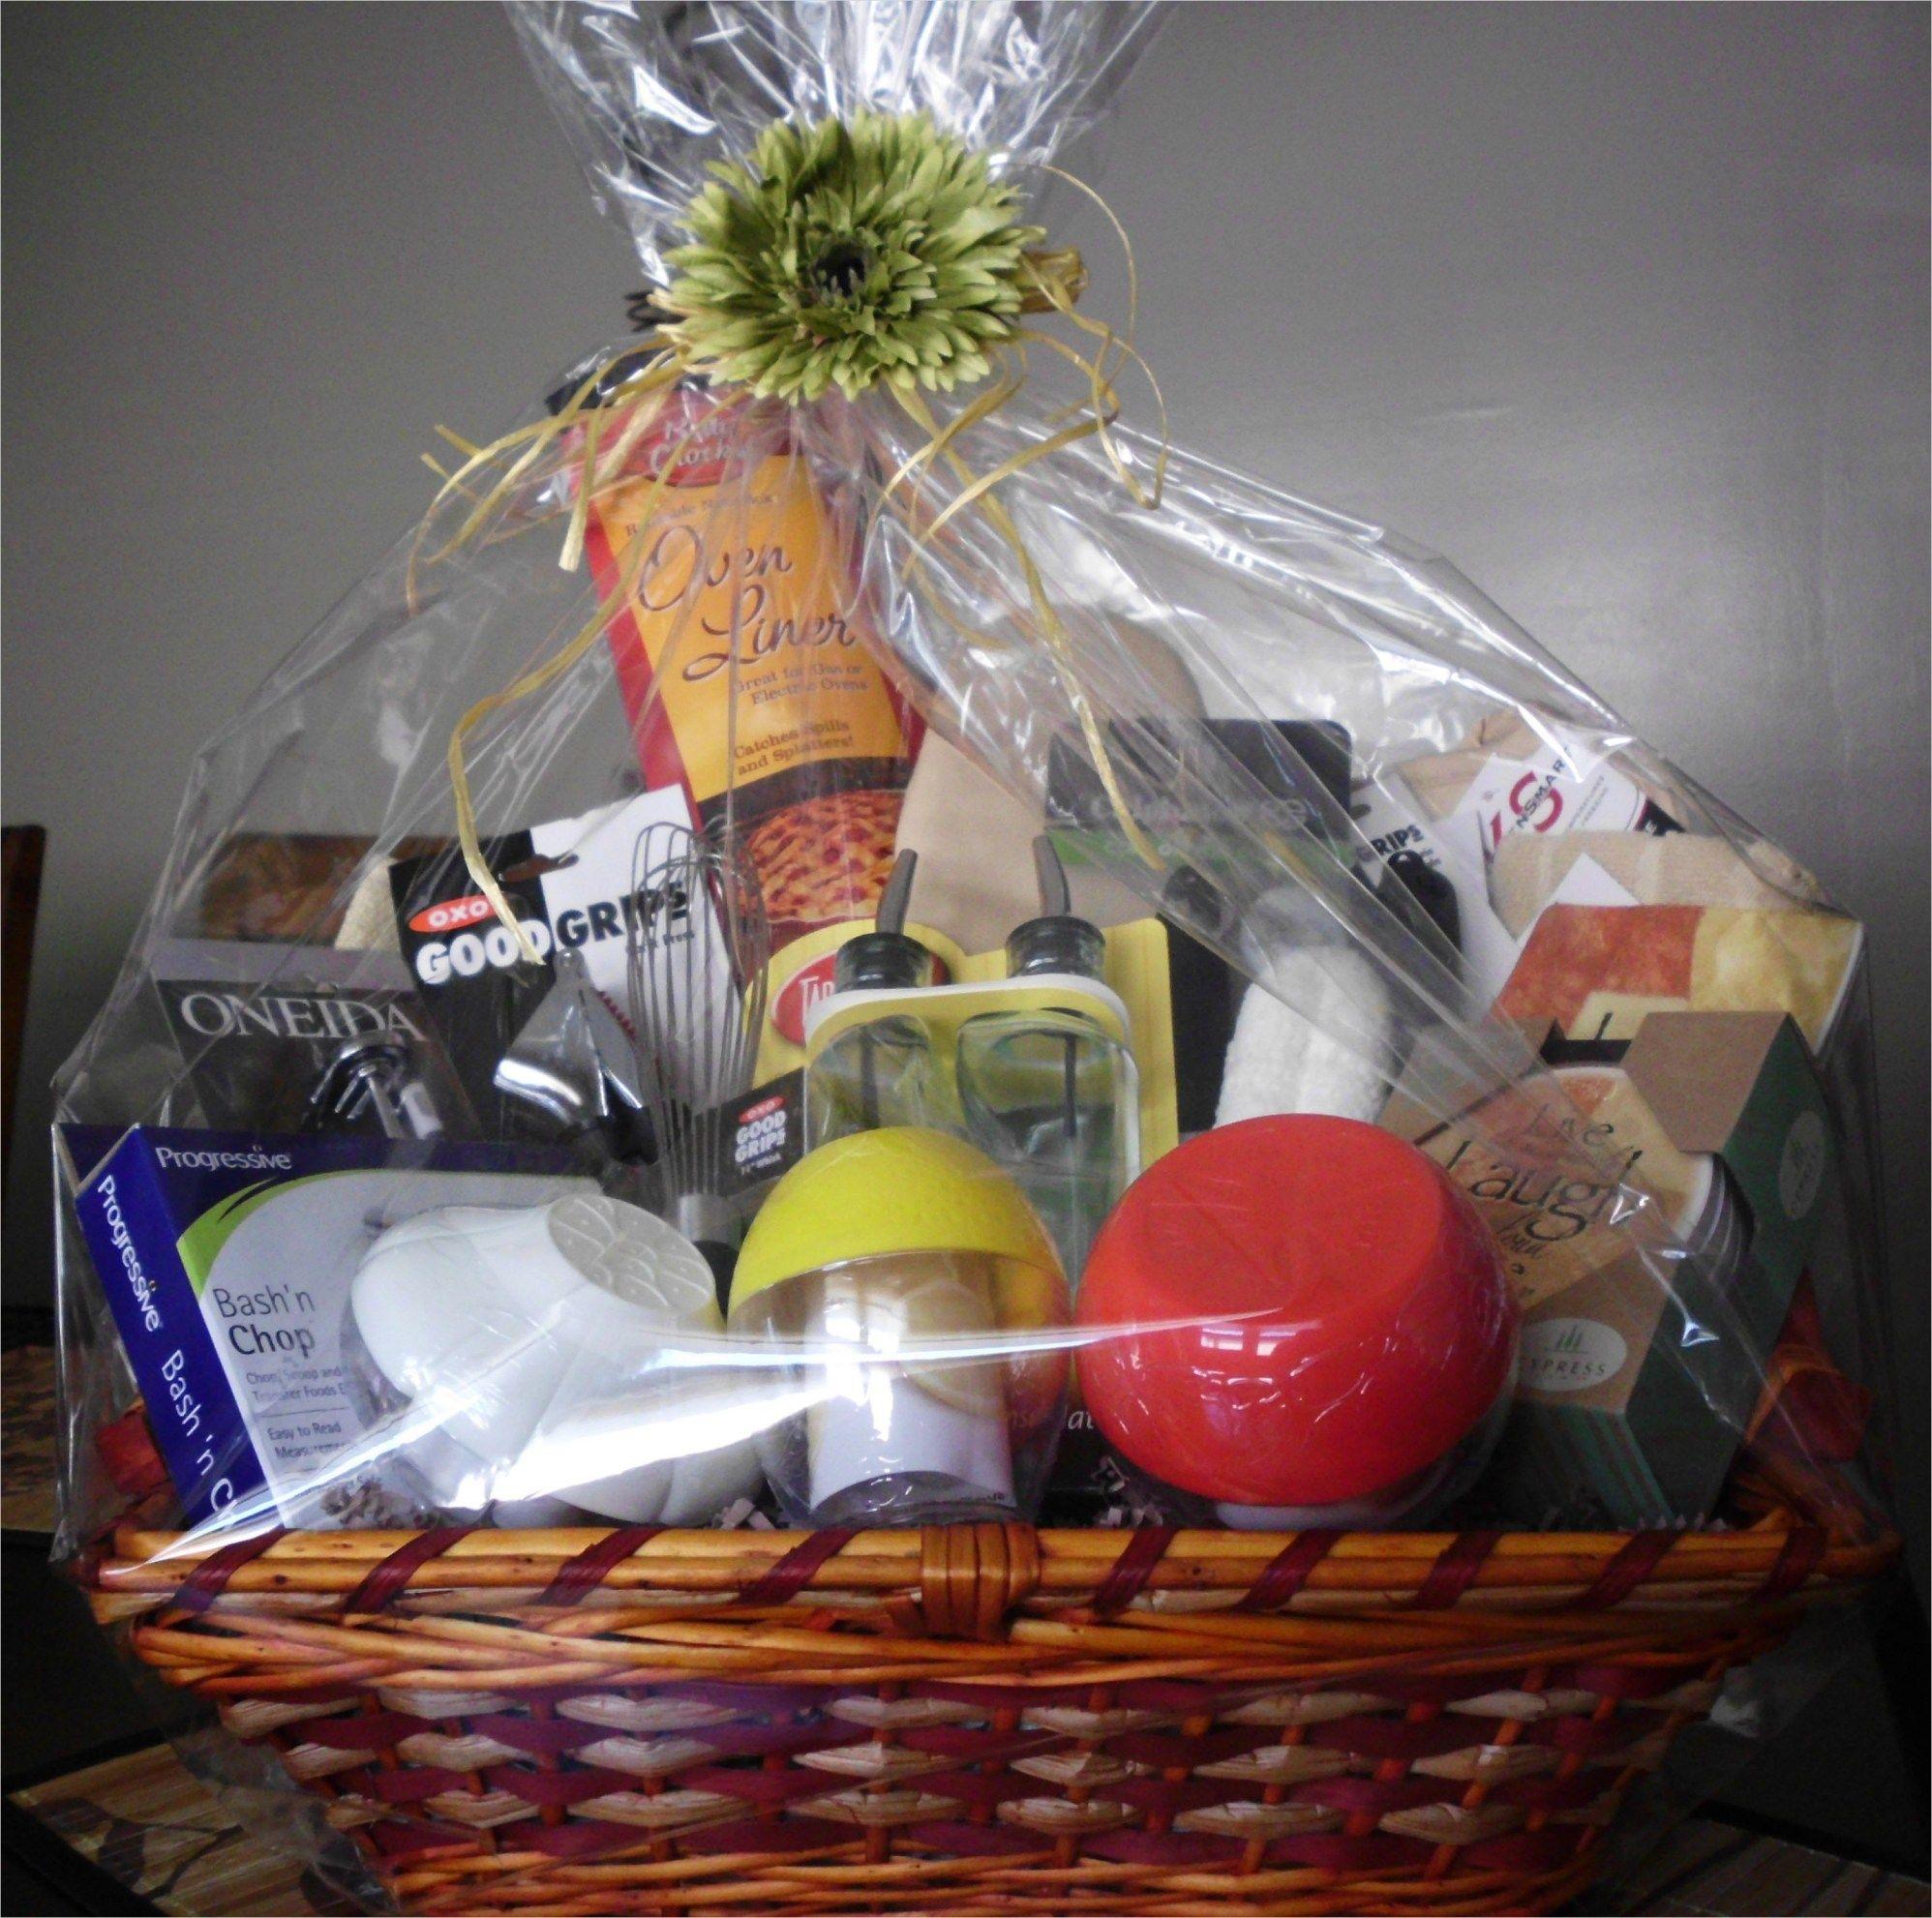 diy wedding gift basket ideas in wedding ideas pinterest